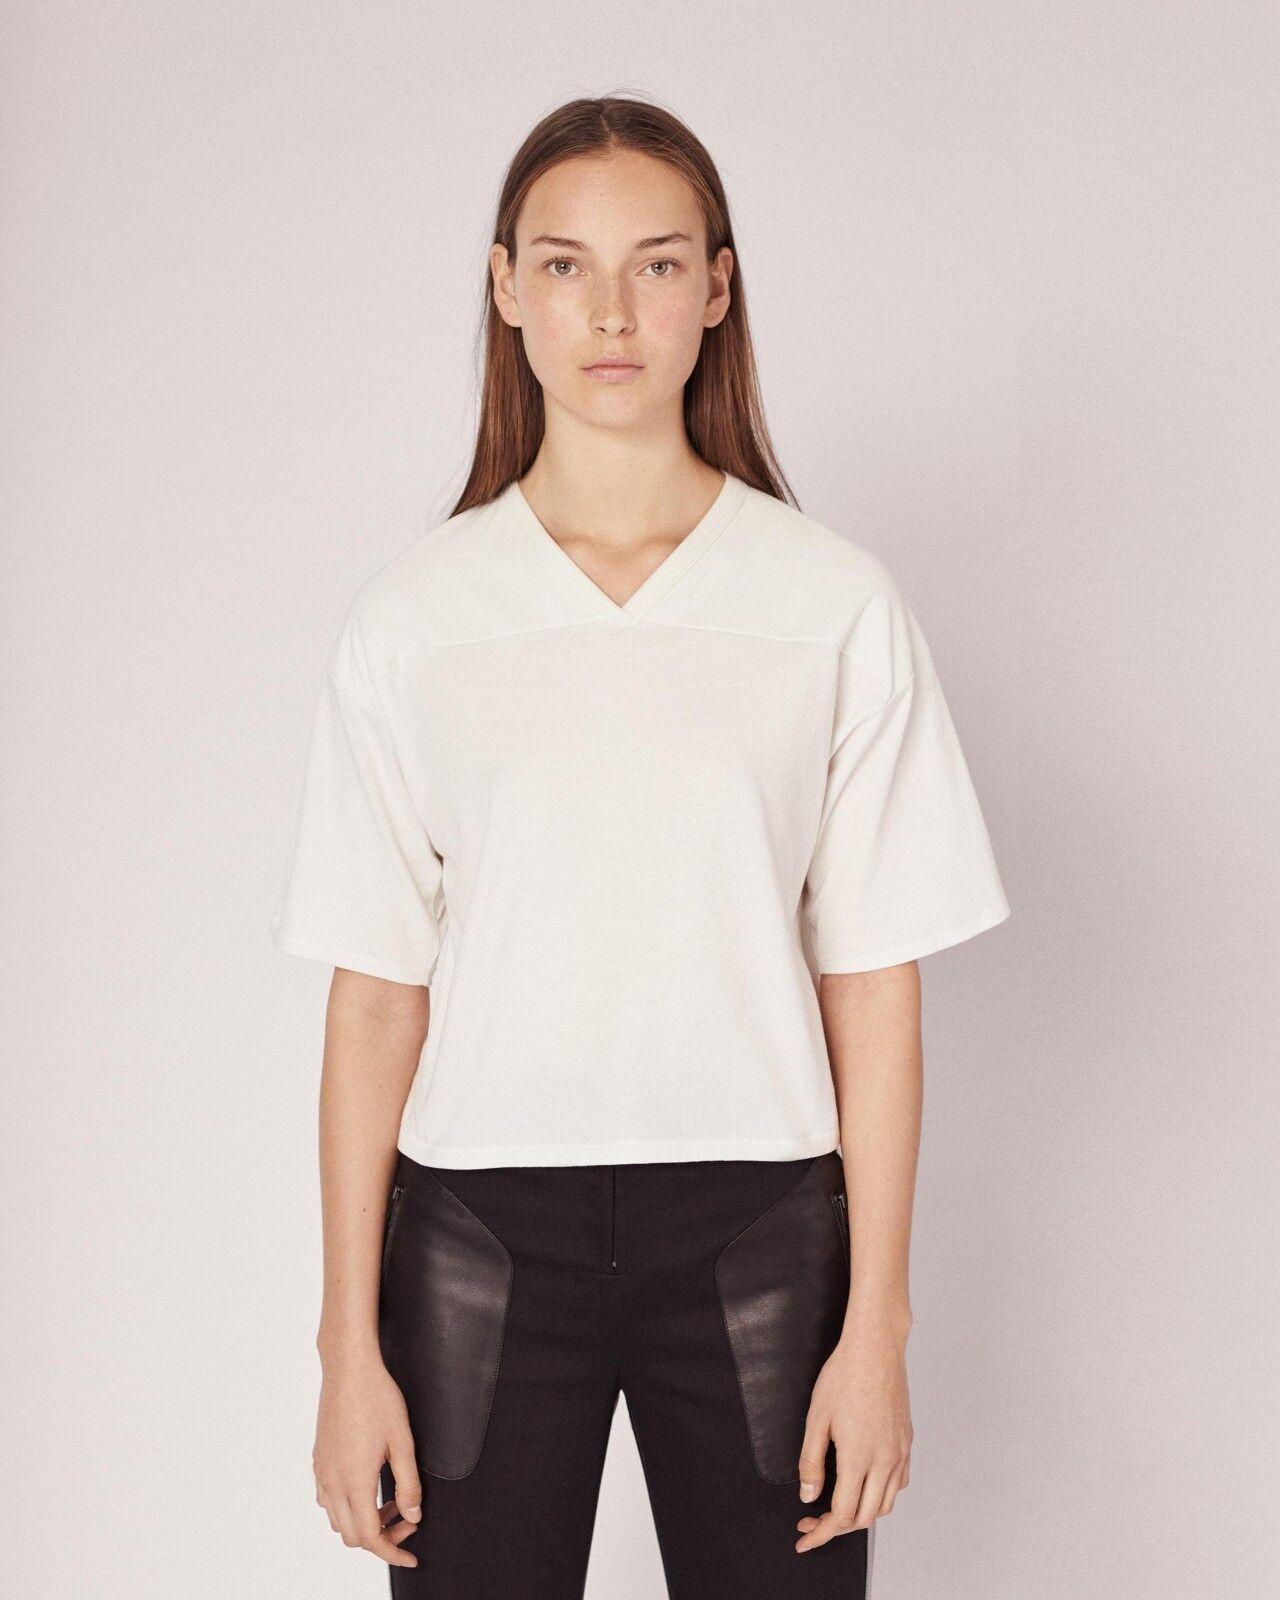 RAG & BONE   JEAN Cropped Training Tee Shirt Top - Off Weiß ( S )